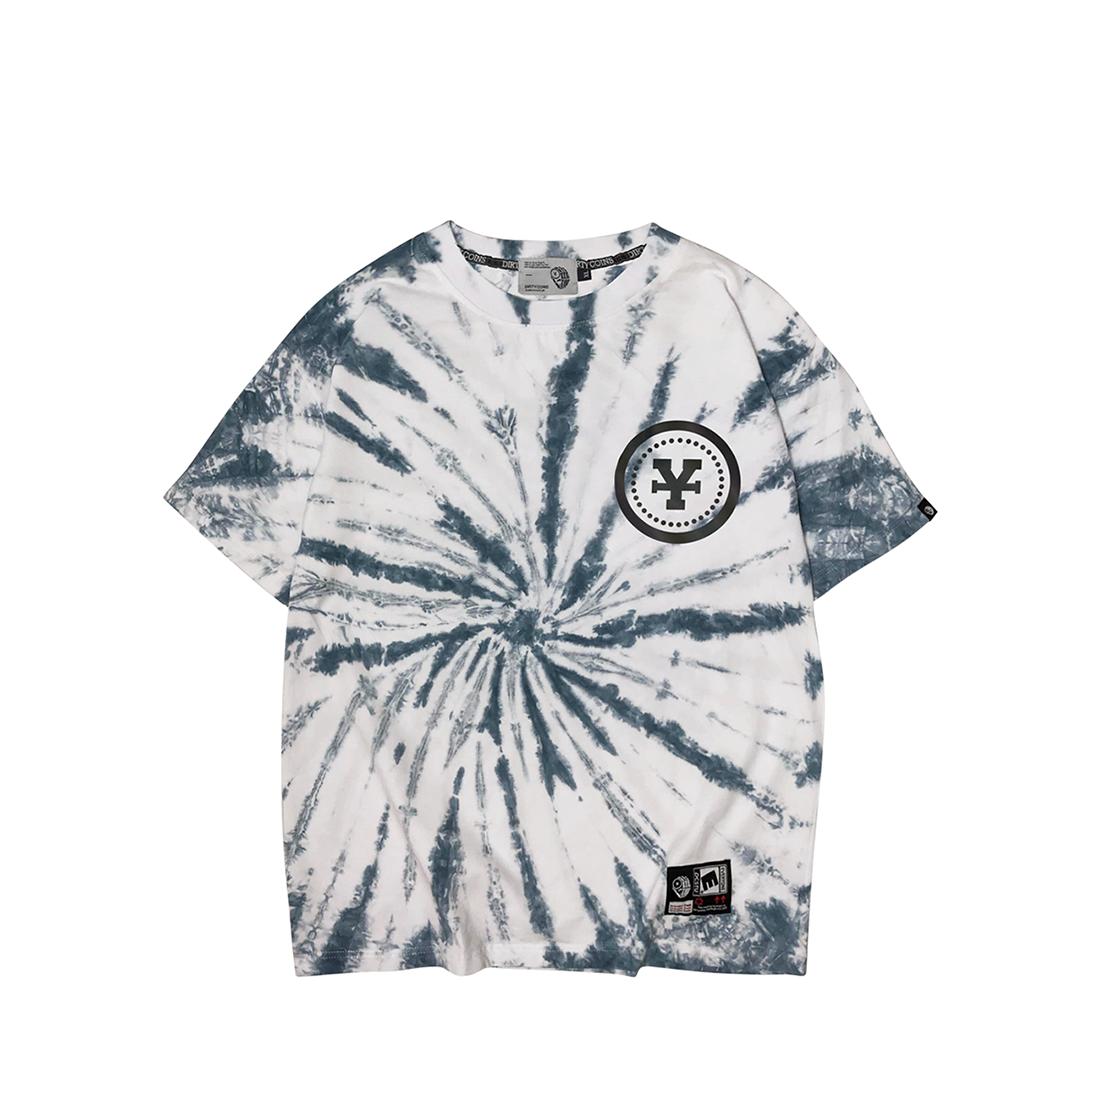 Hologram Mercury Tie-Dye T-Shirt